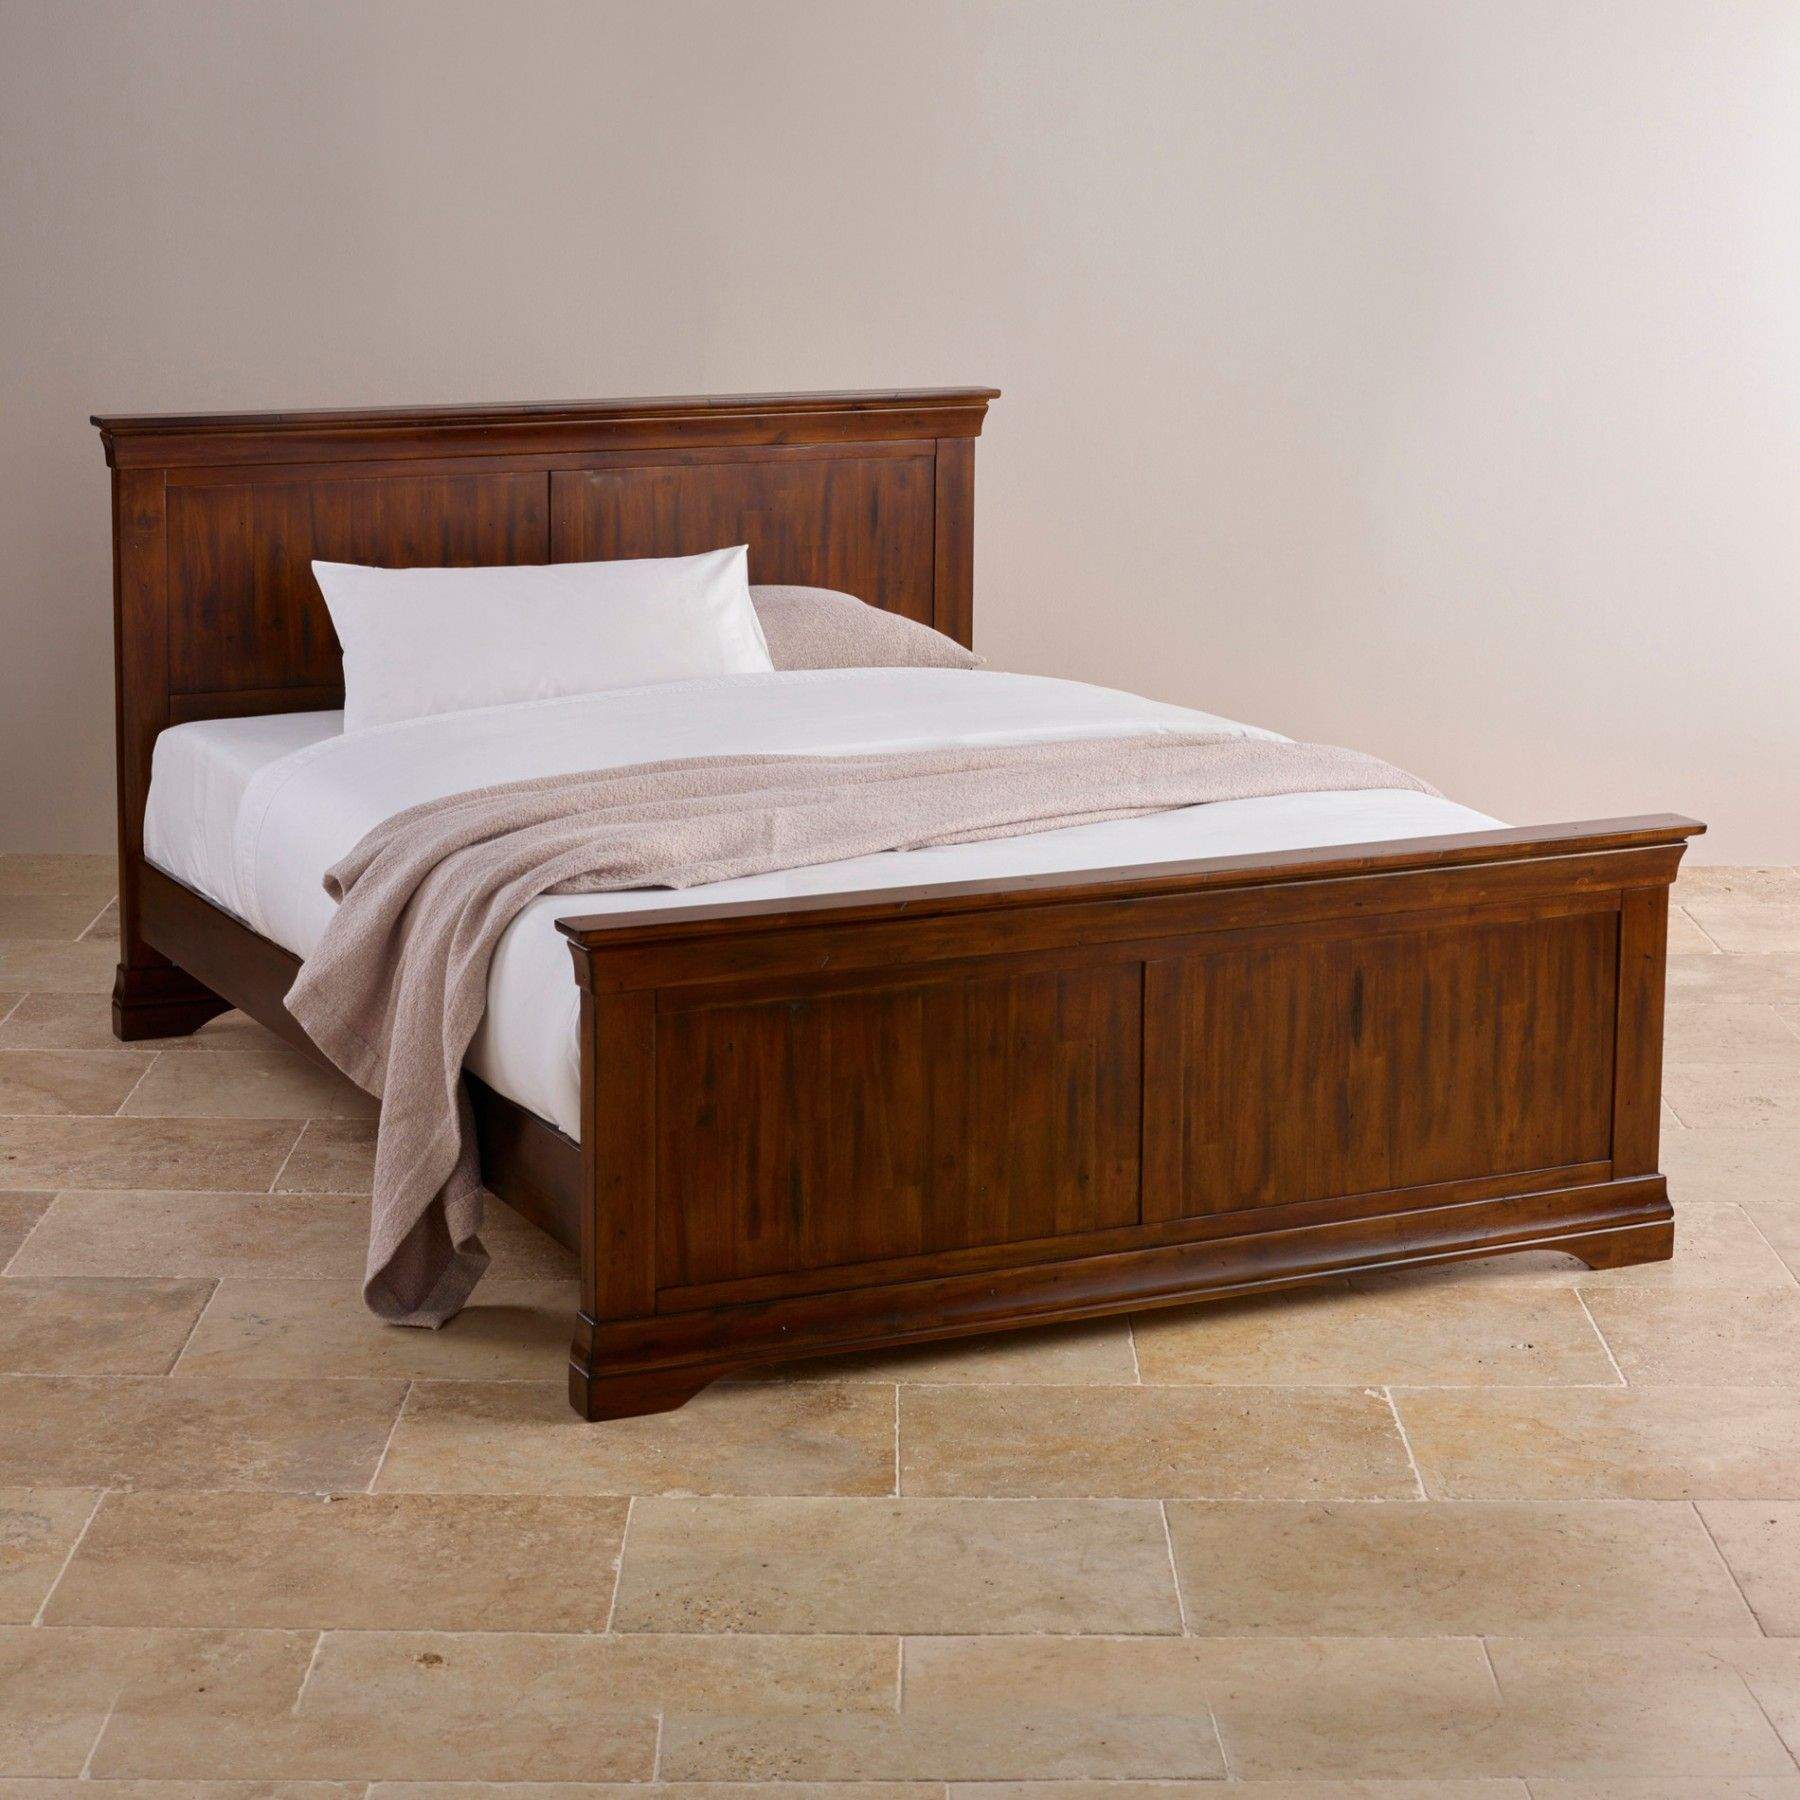 Victoria Solid Hardwood 5ft Queen Bed Super king size